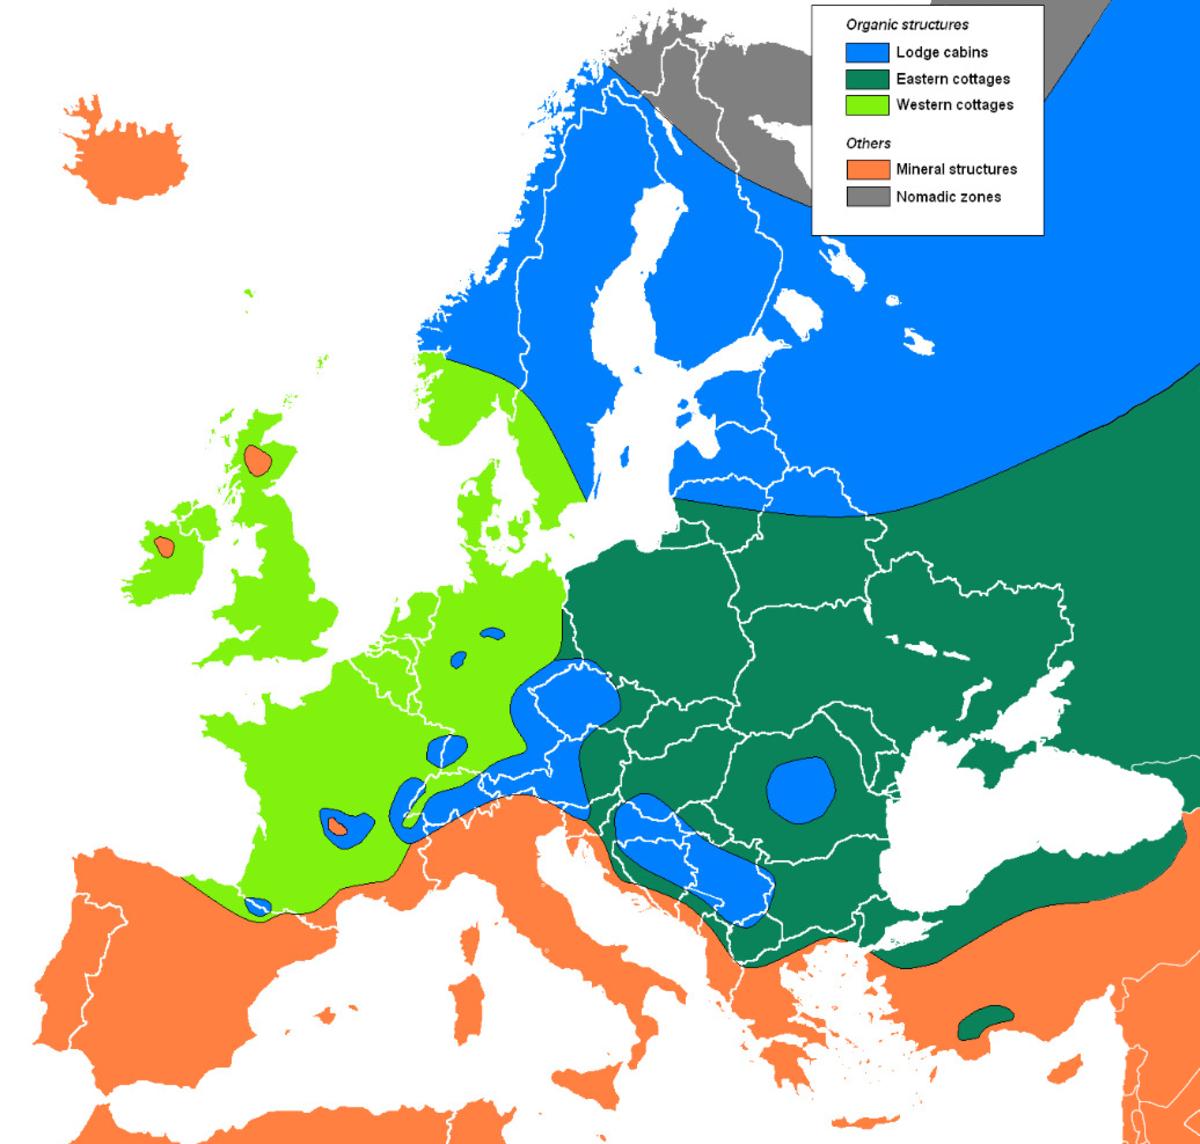 Europe: Vernacular Architecture